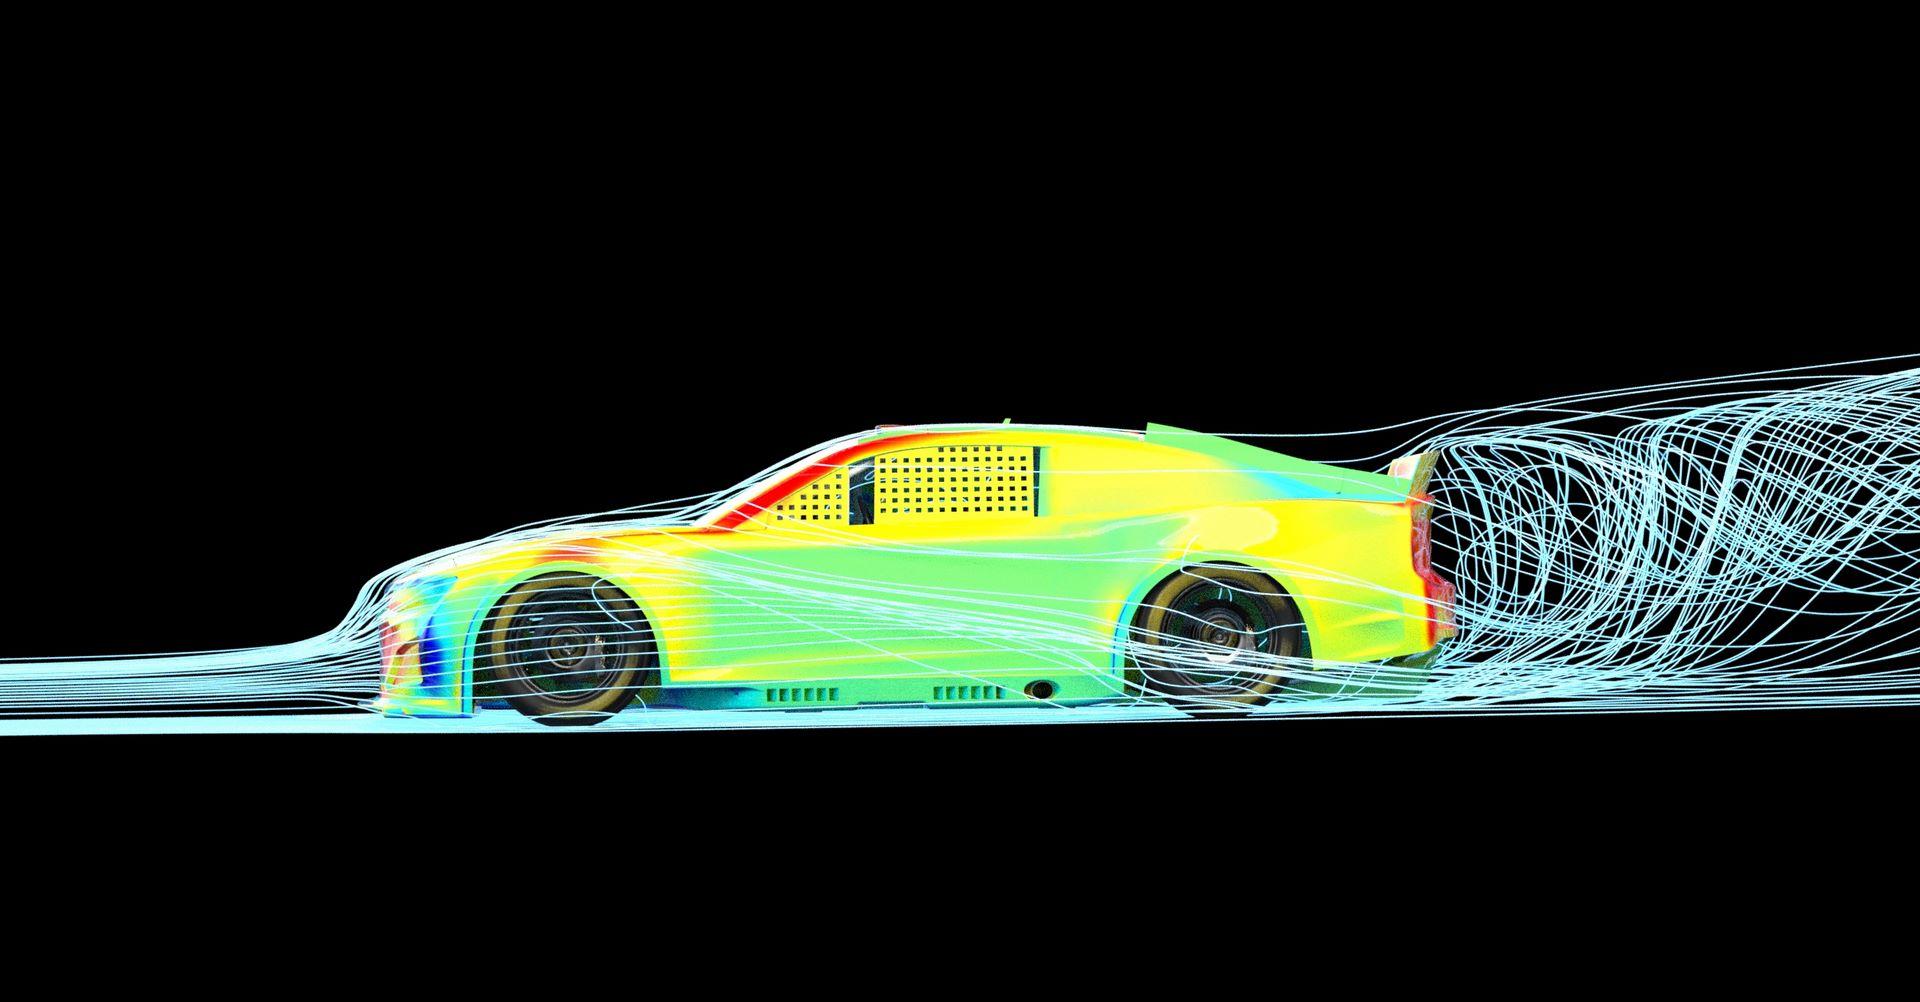 Chevrolet-Camaro-ZL1-RaceCarr-Next-Gen-Nascar-10